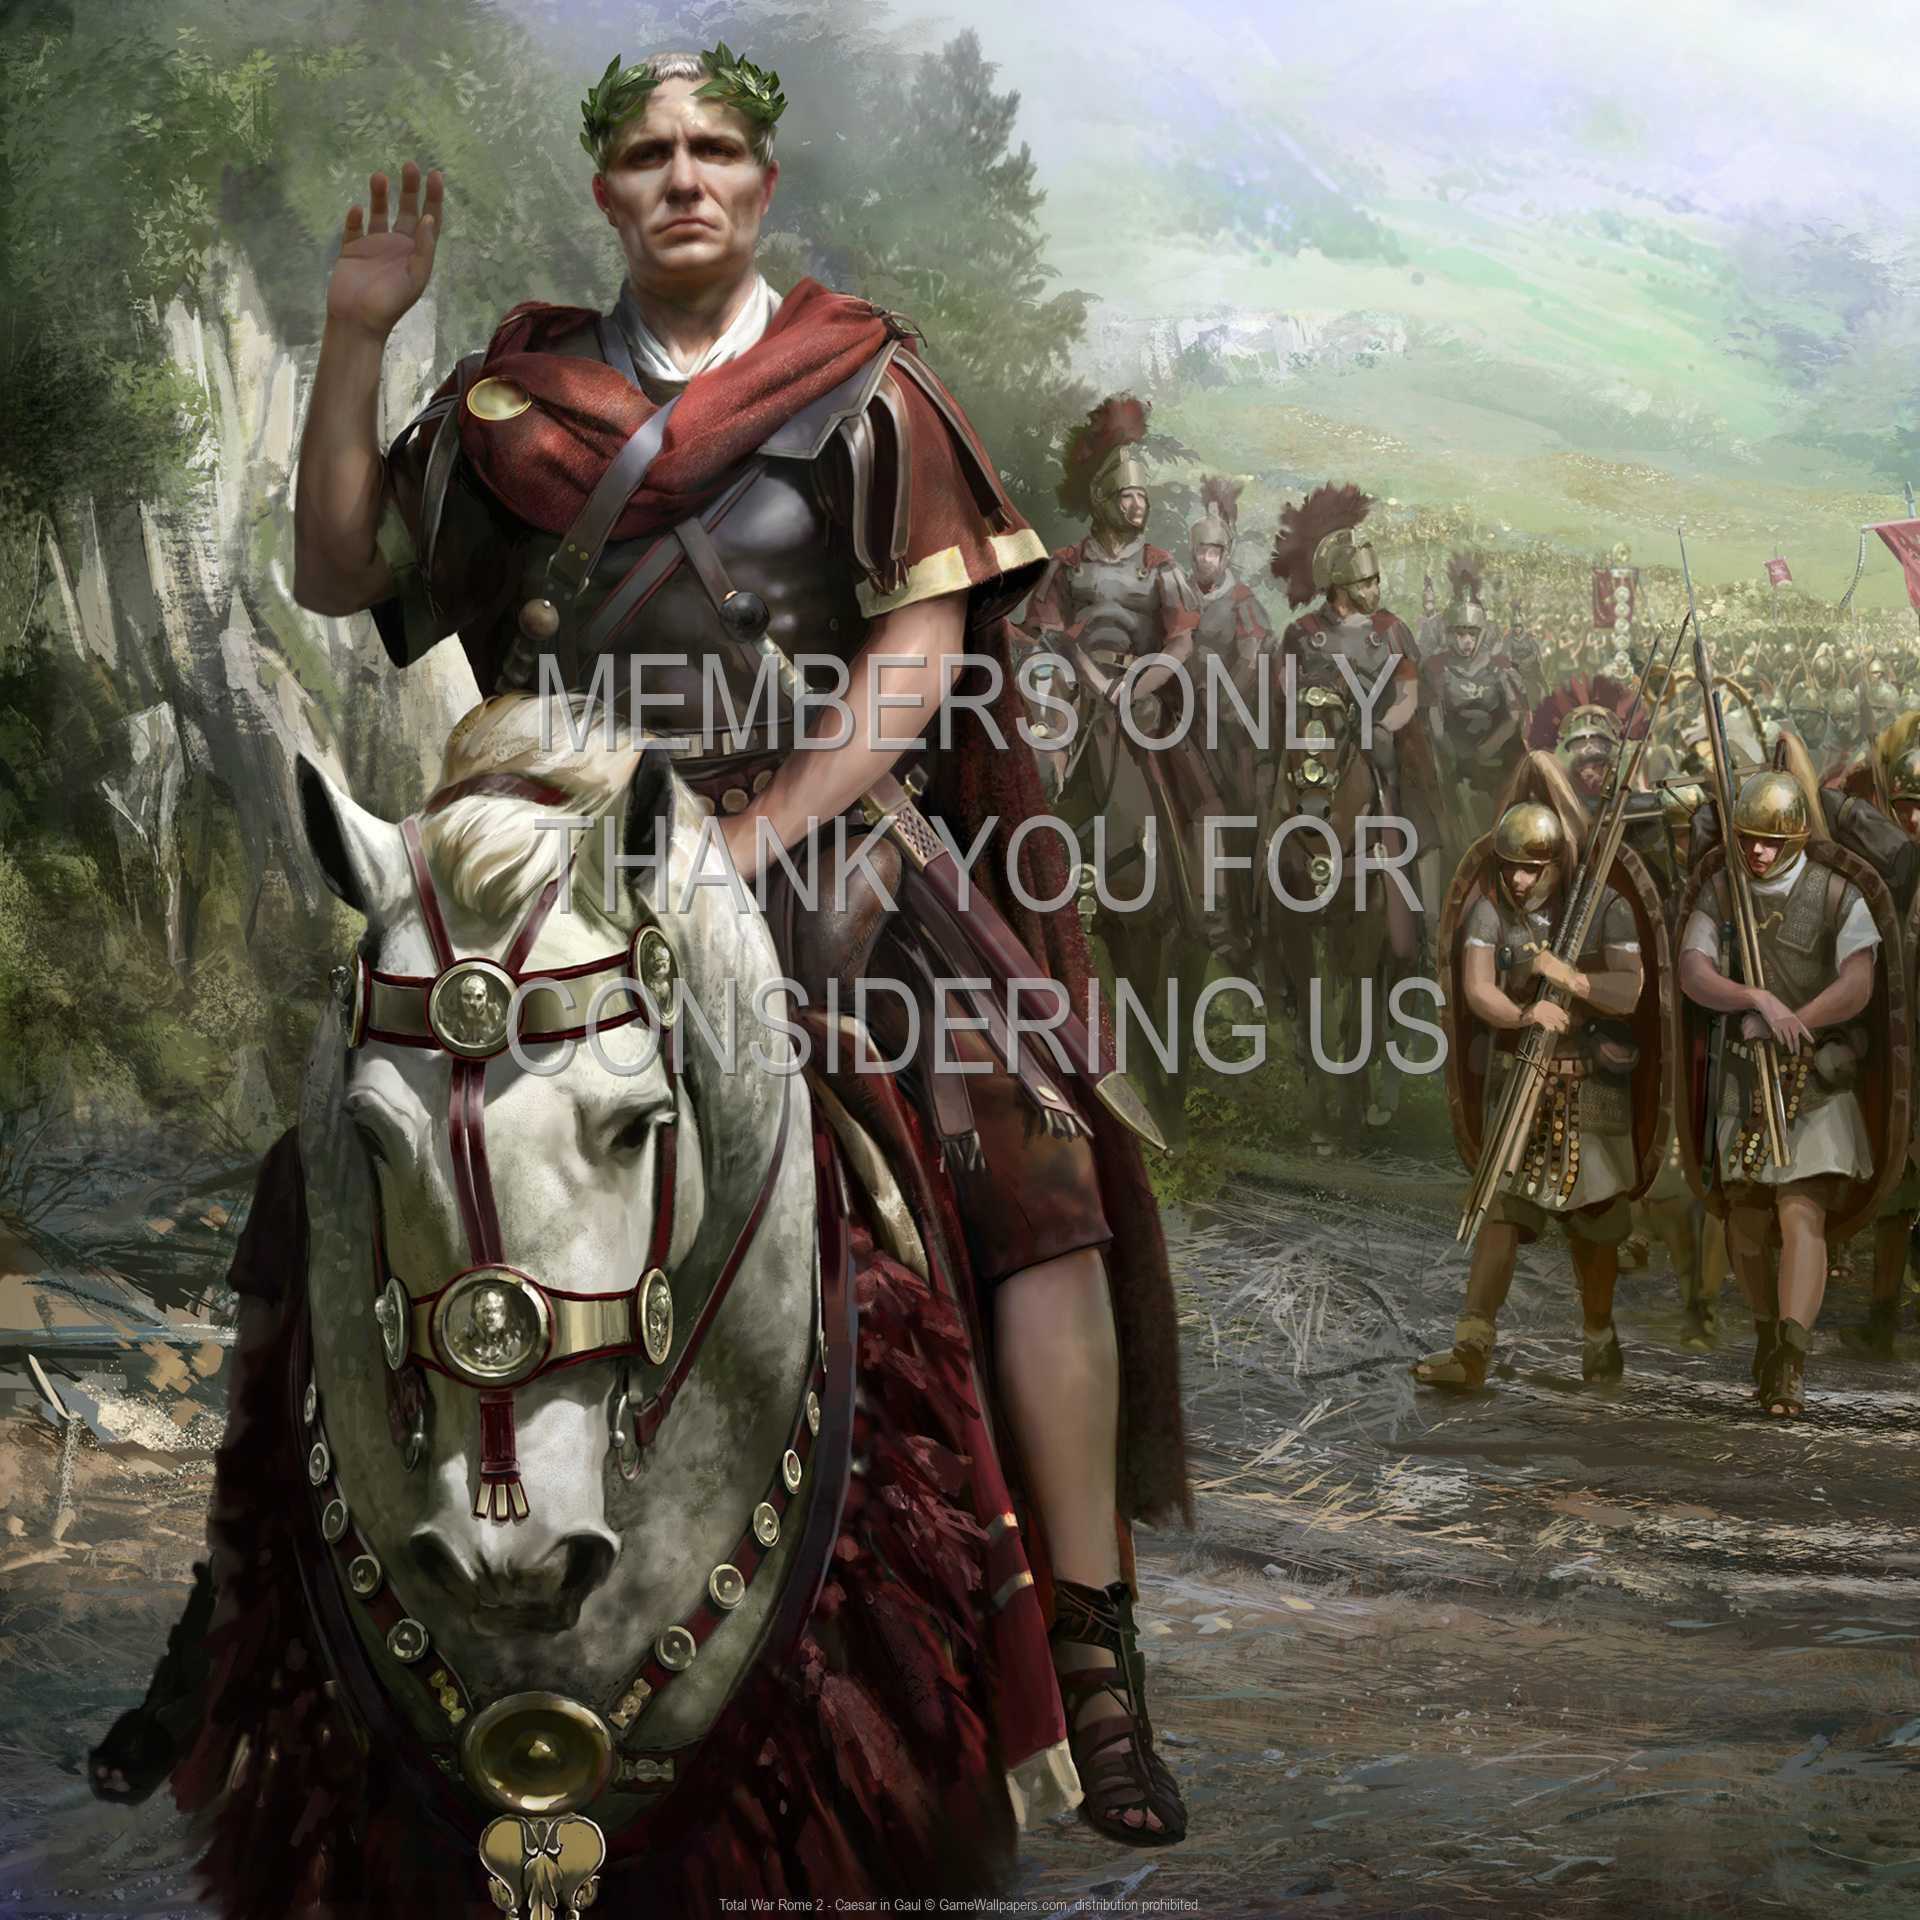 Total War: Rome 2 - Caesar in Gaul 1080p Horizontal Mobile wallpaper or background 01